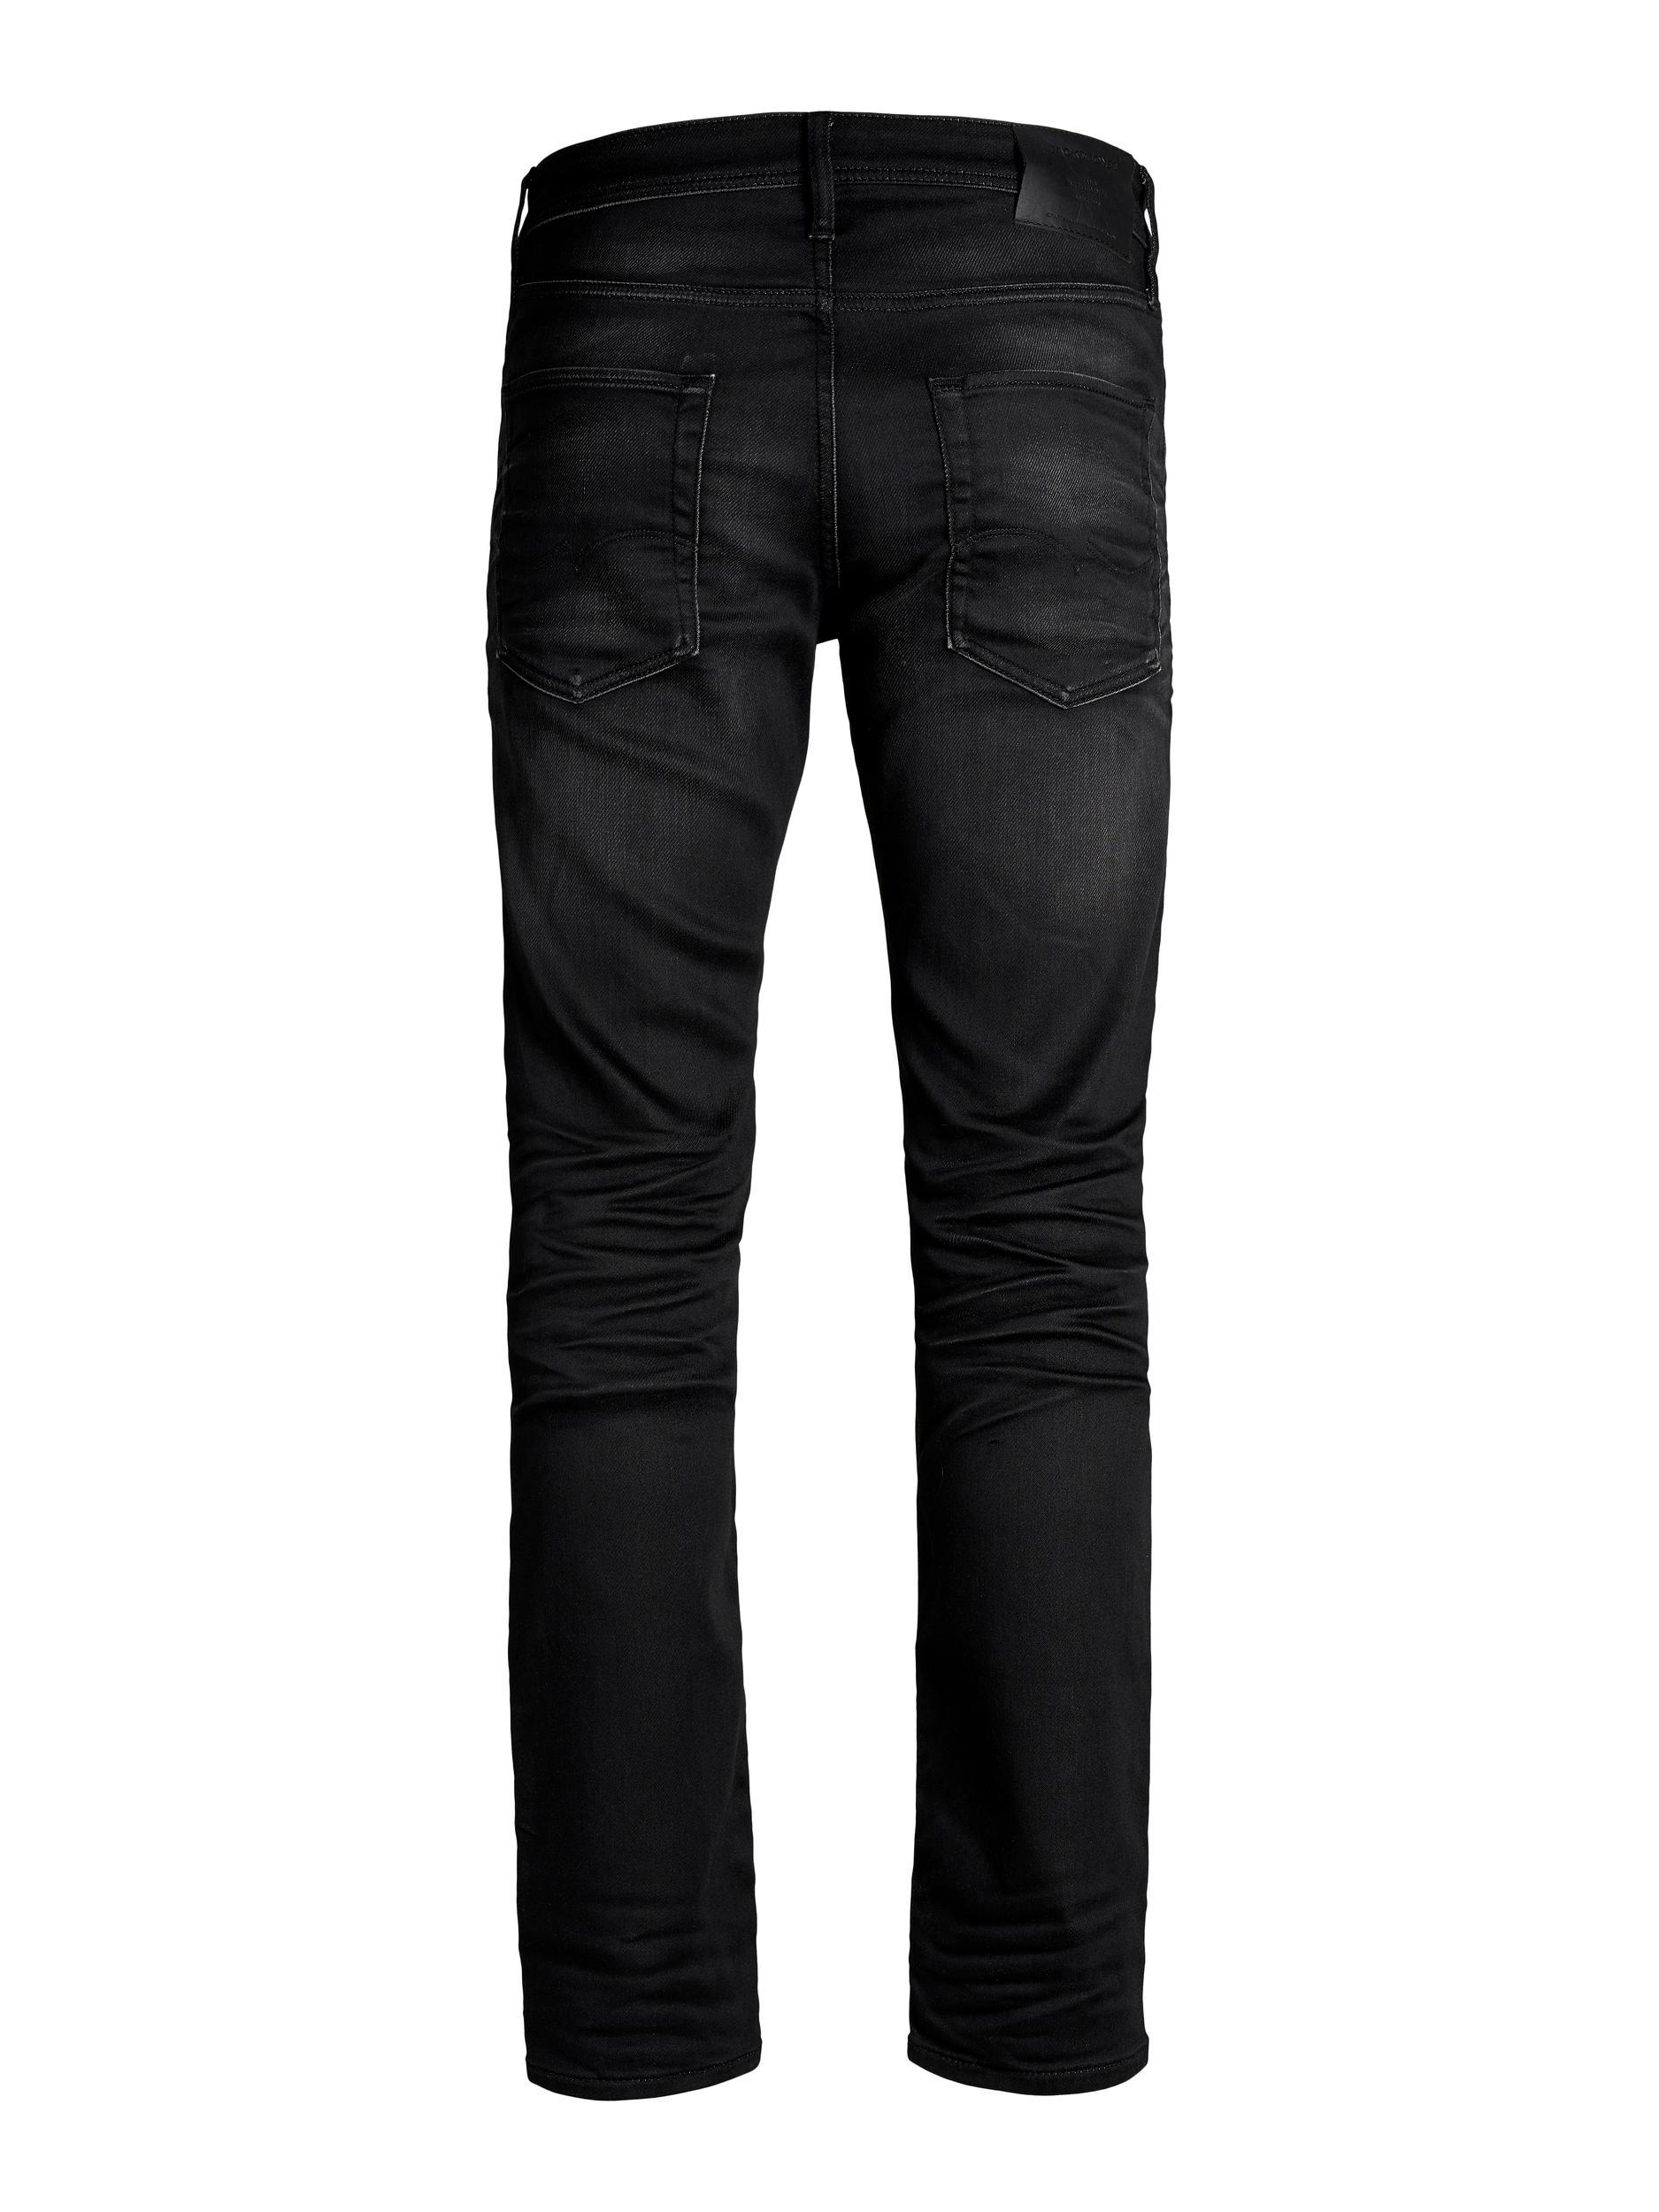 Jack & Jones Mike Original jeans, black denim, 29/32